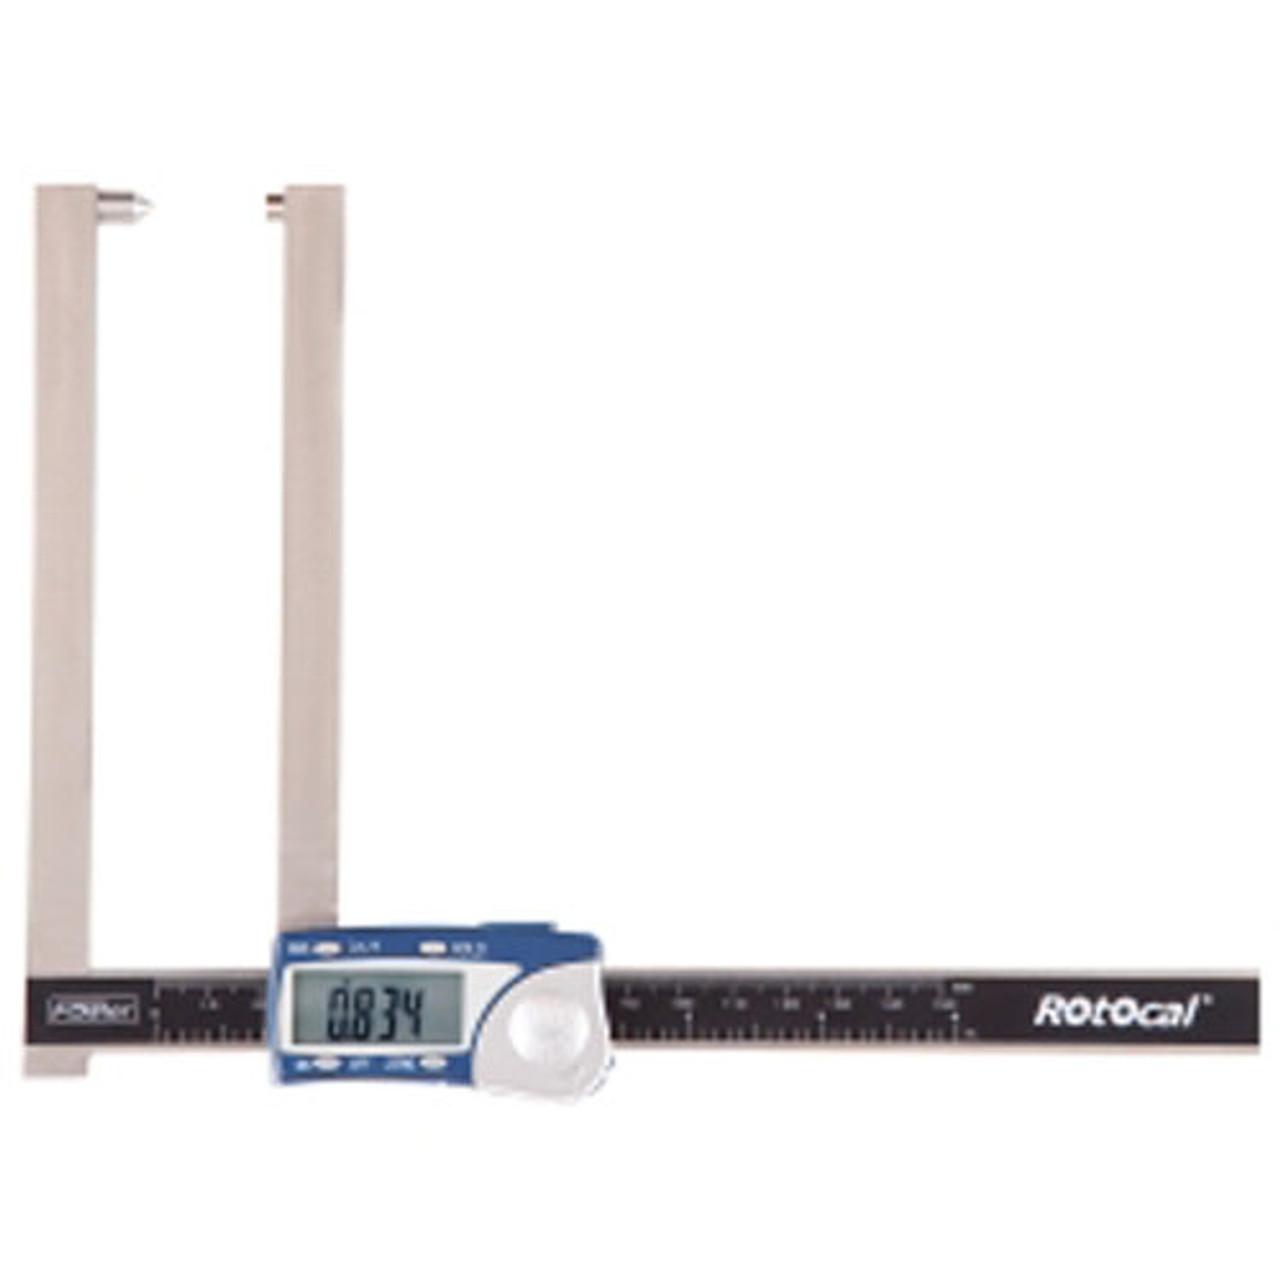 FOWLER Drum /& Rotor Measuring Kitwith Electronic Caliper FOW74-101-777